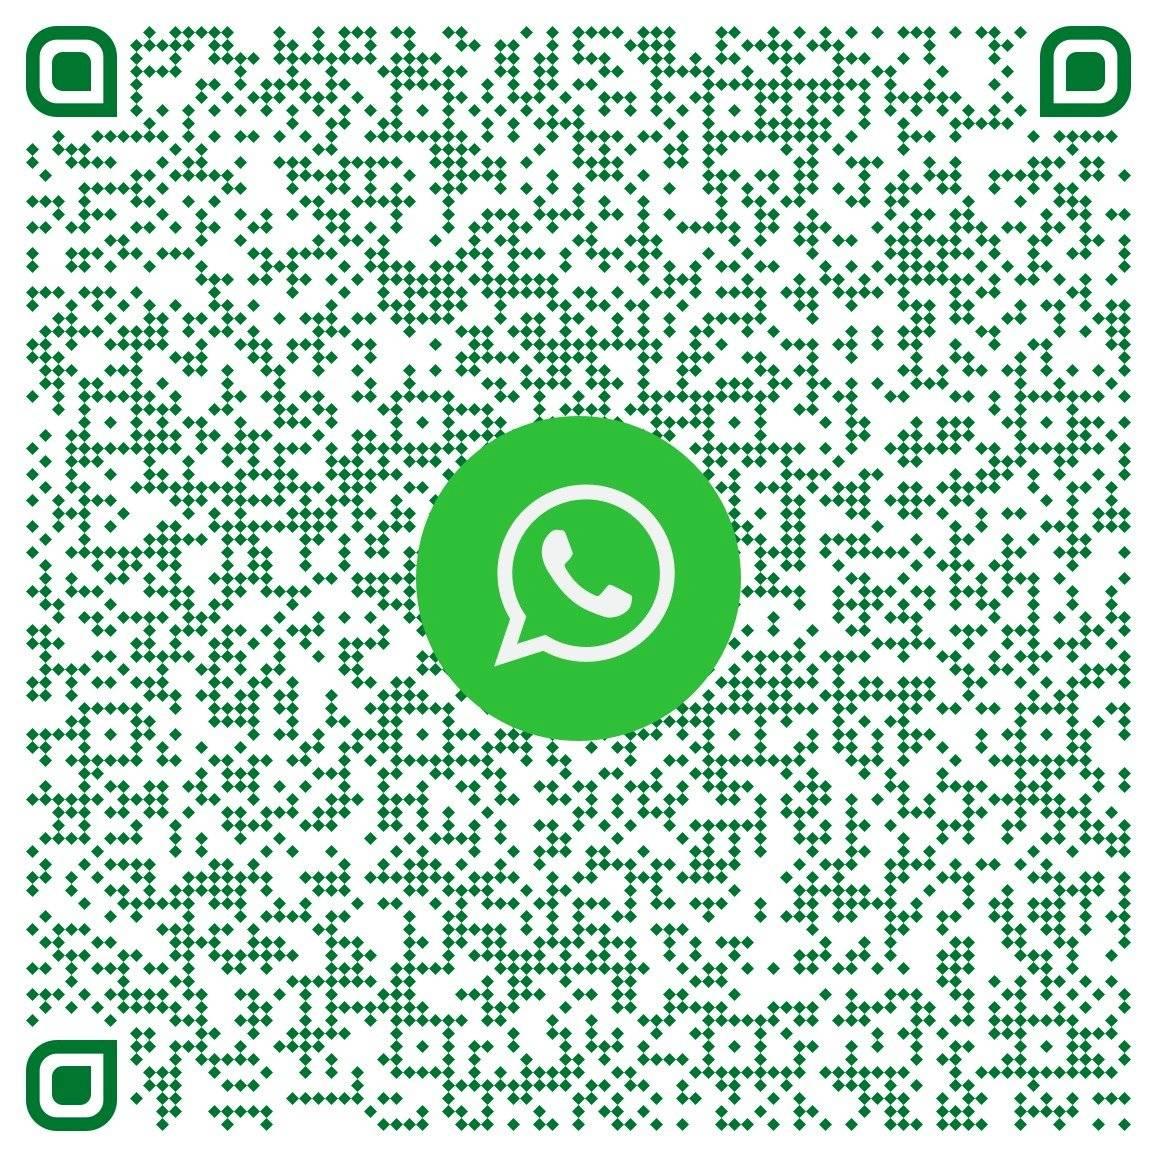 Código QR para recibir Publimetro gratis por WhatsApp en PDF